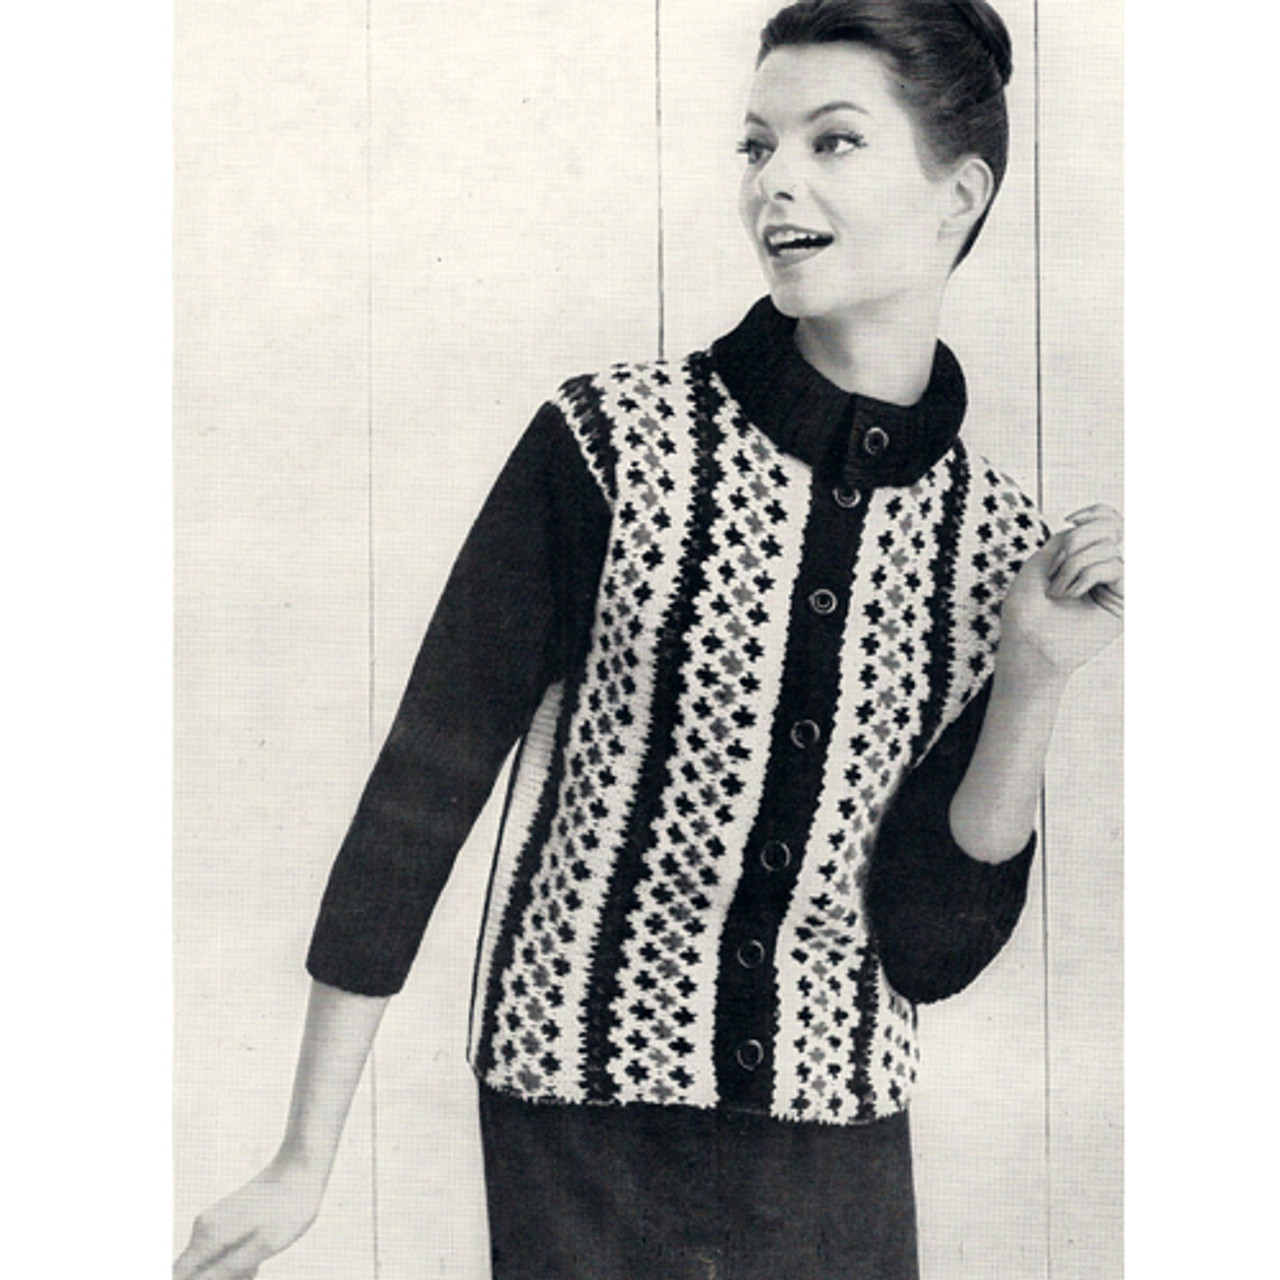 Knitted Fair Isle Jacket pattern, Vintage 1960s